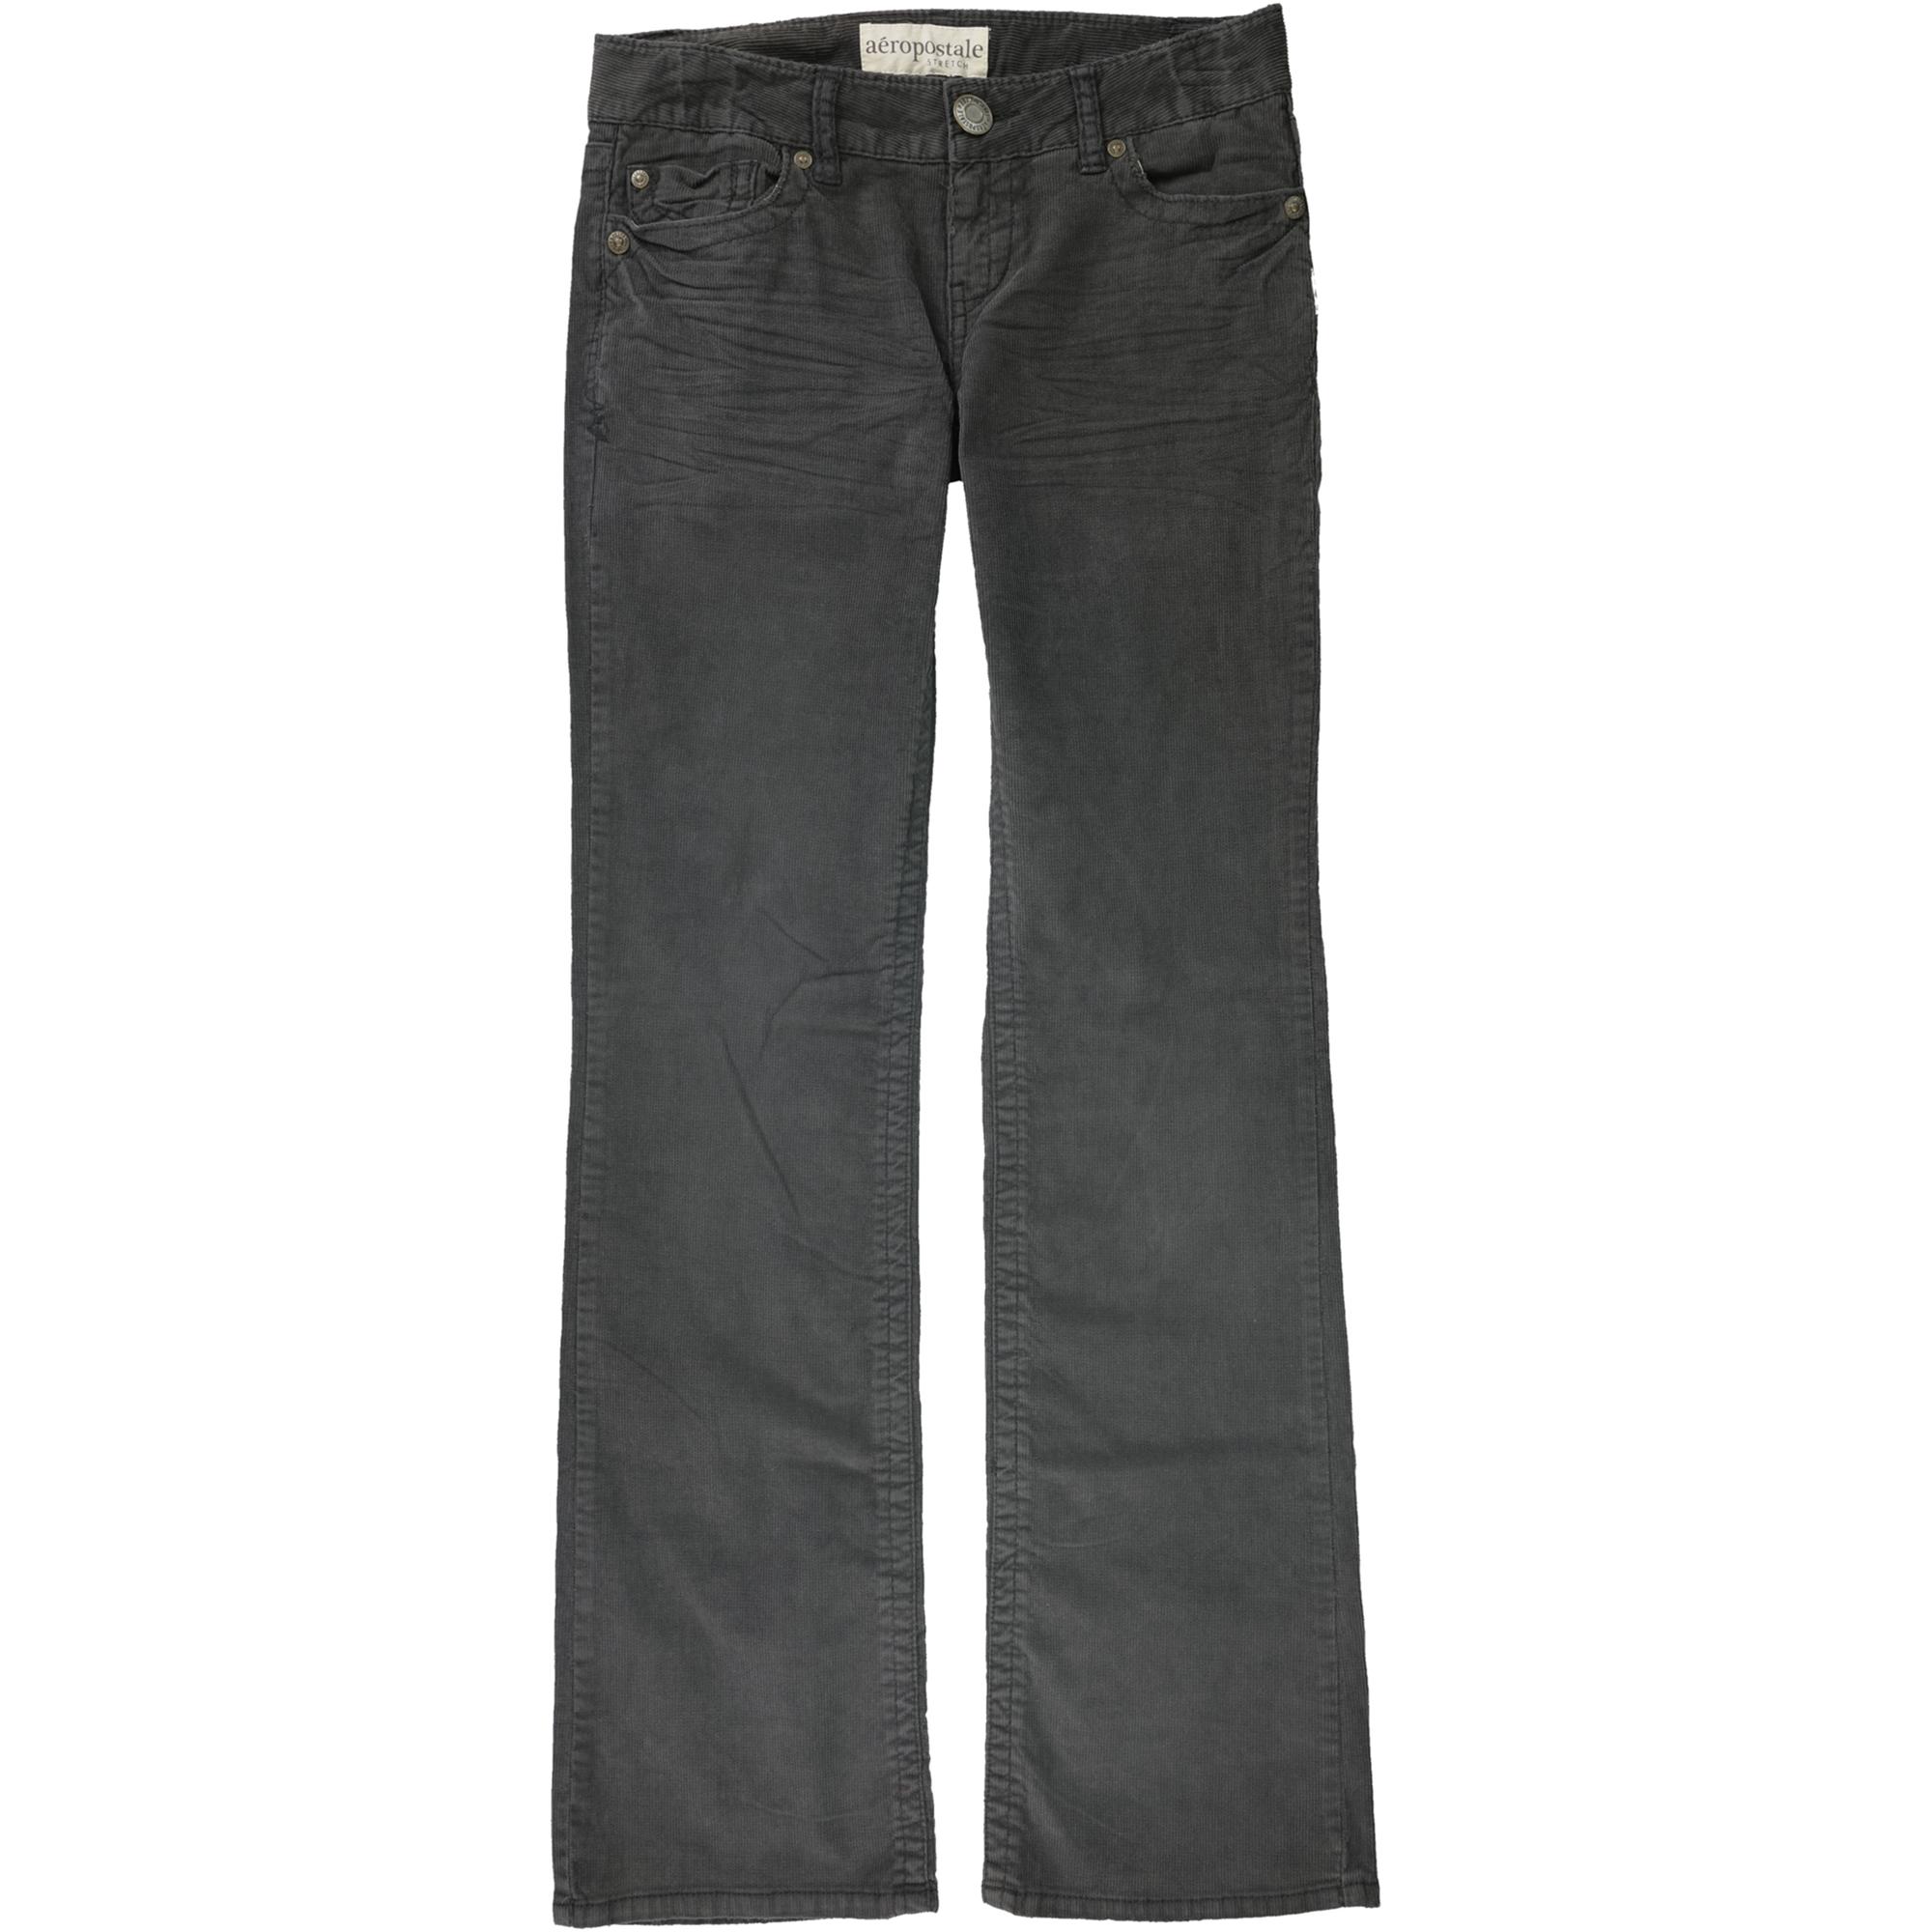 Aeropostale Womens Solid Casual Corduroy Pants